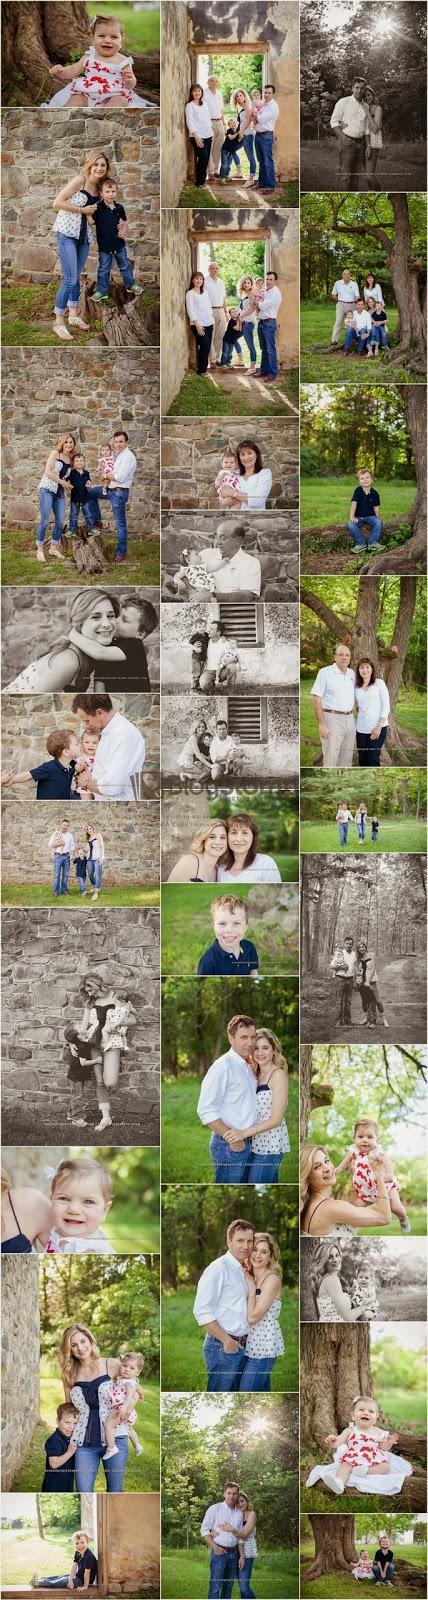 portrait photographer, family photographer, Virginia photographer, leesburg va, lifestyle photography, loudoun county, red rock overlook park, va photographer,